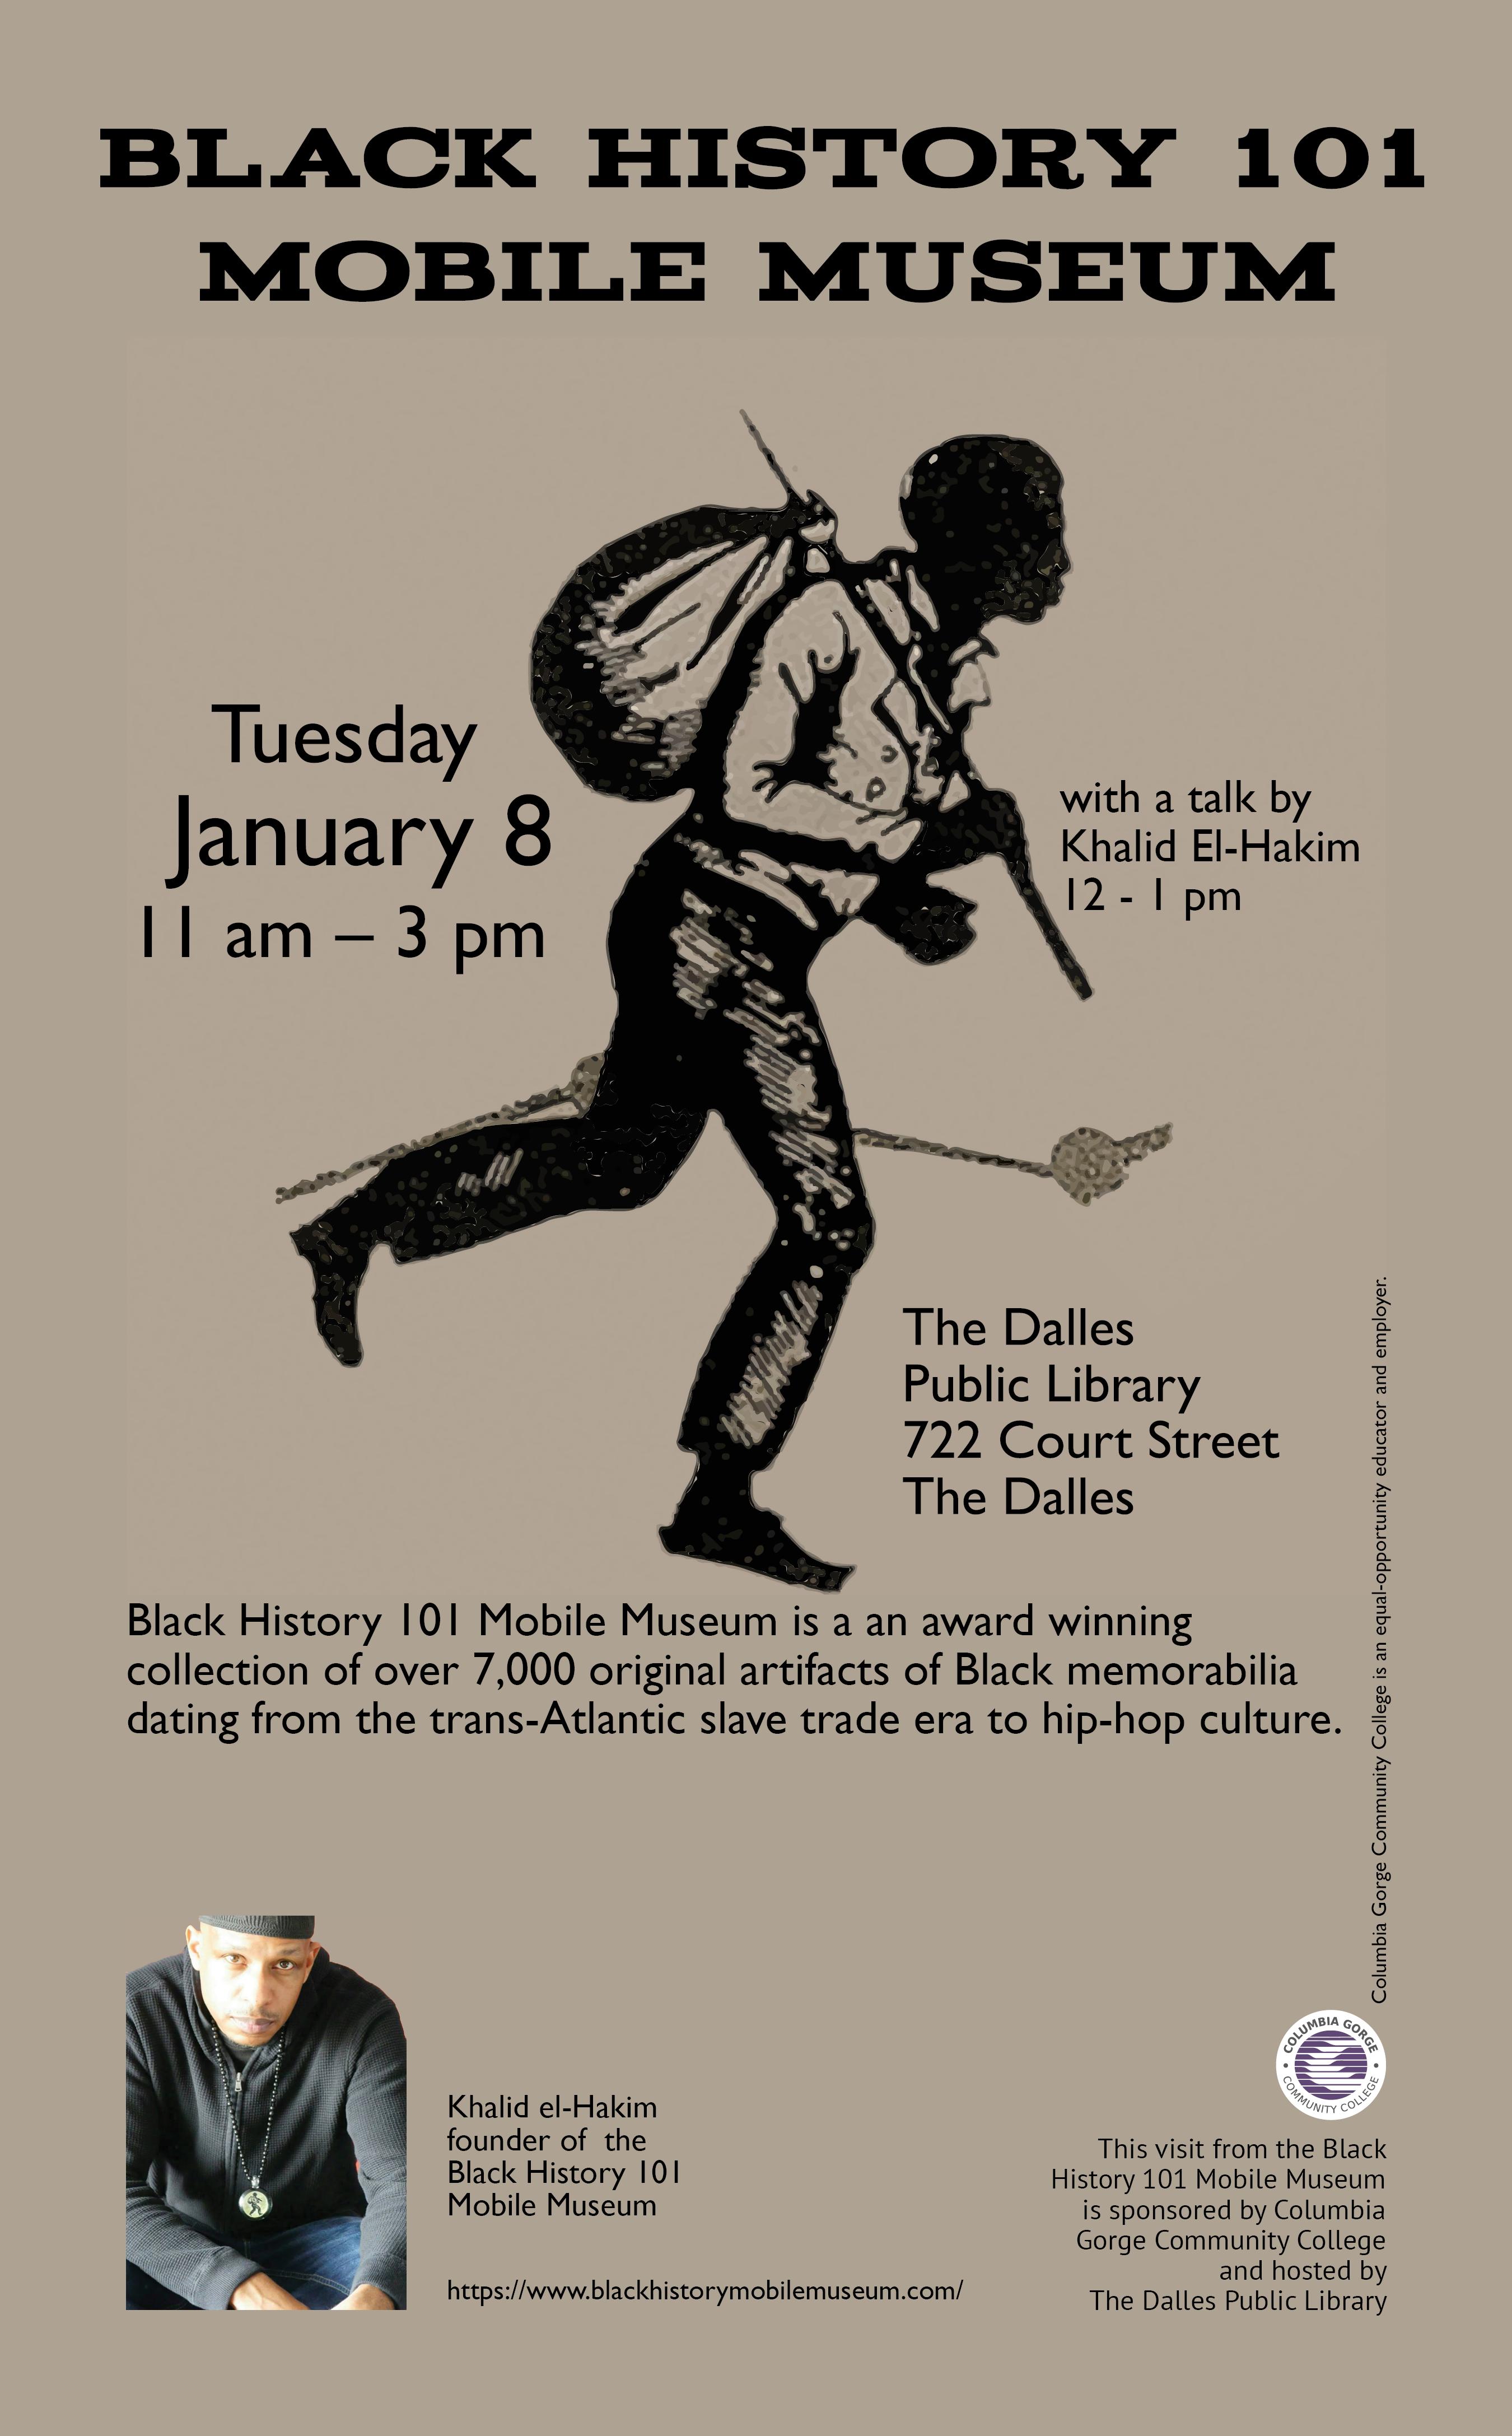 Black History 101 Mobile Museum | Columbia Gorge Community